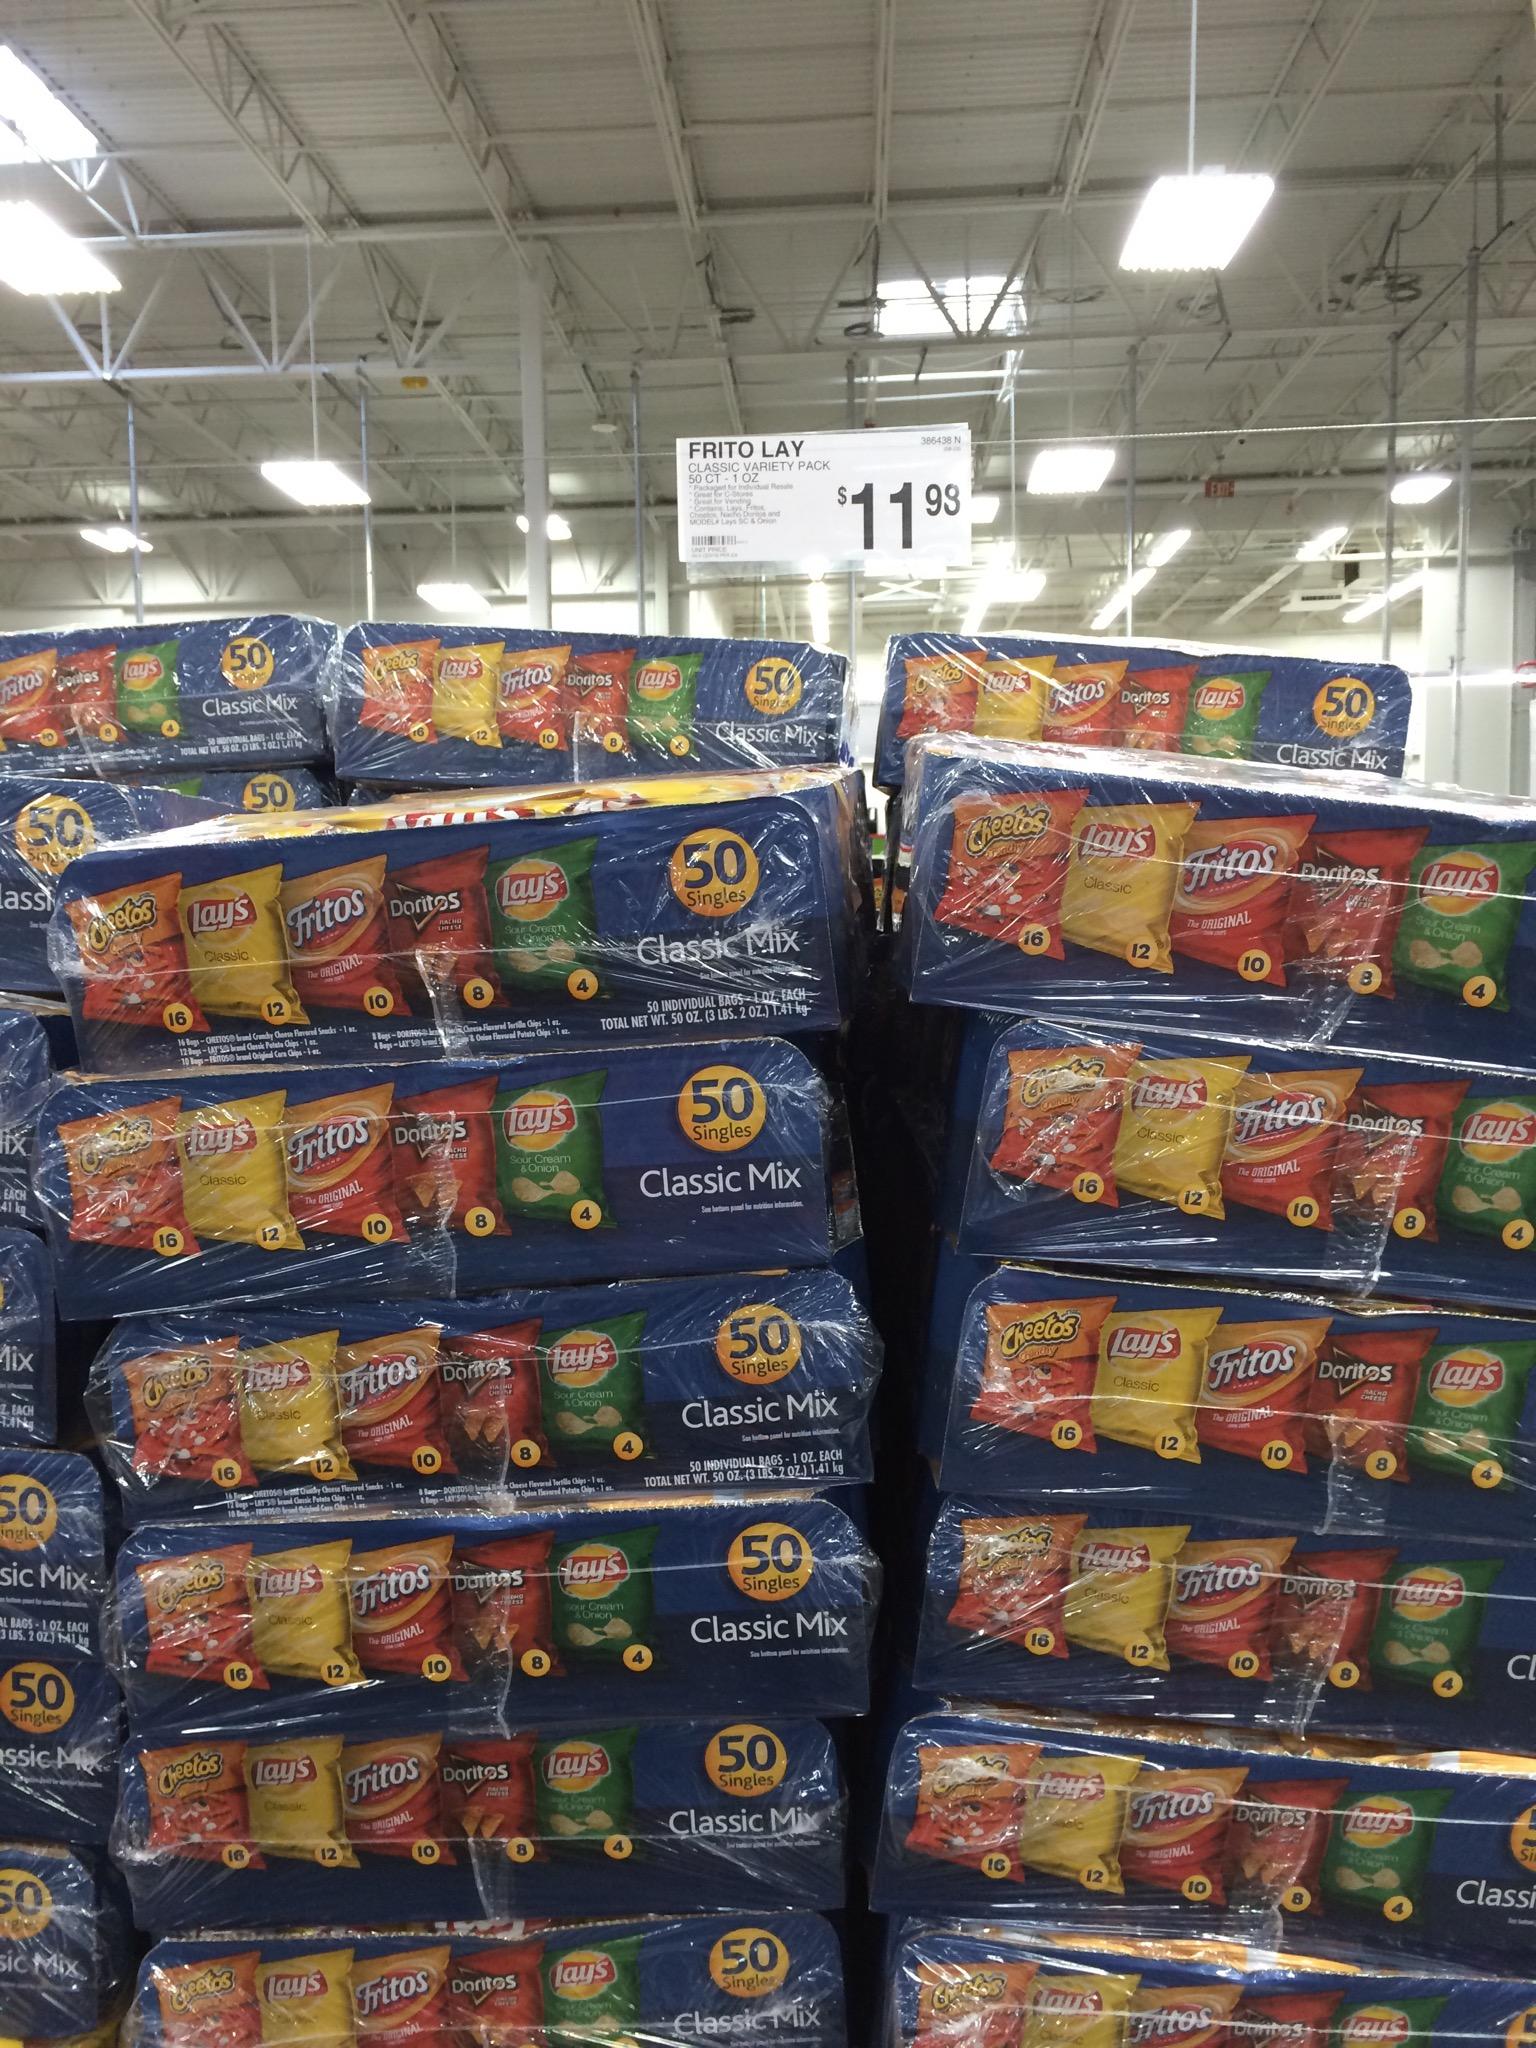 Sam S Club Vs Costco Prices Snack Food Prices